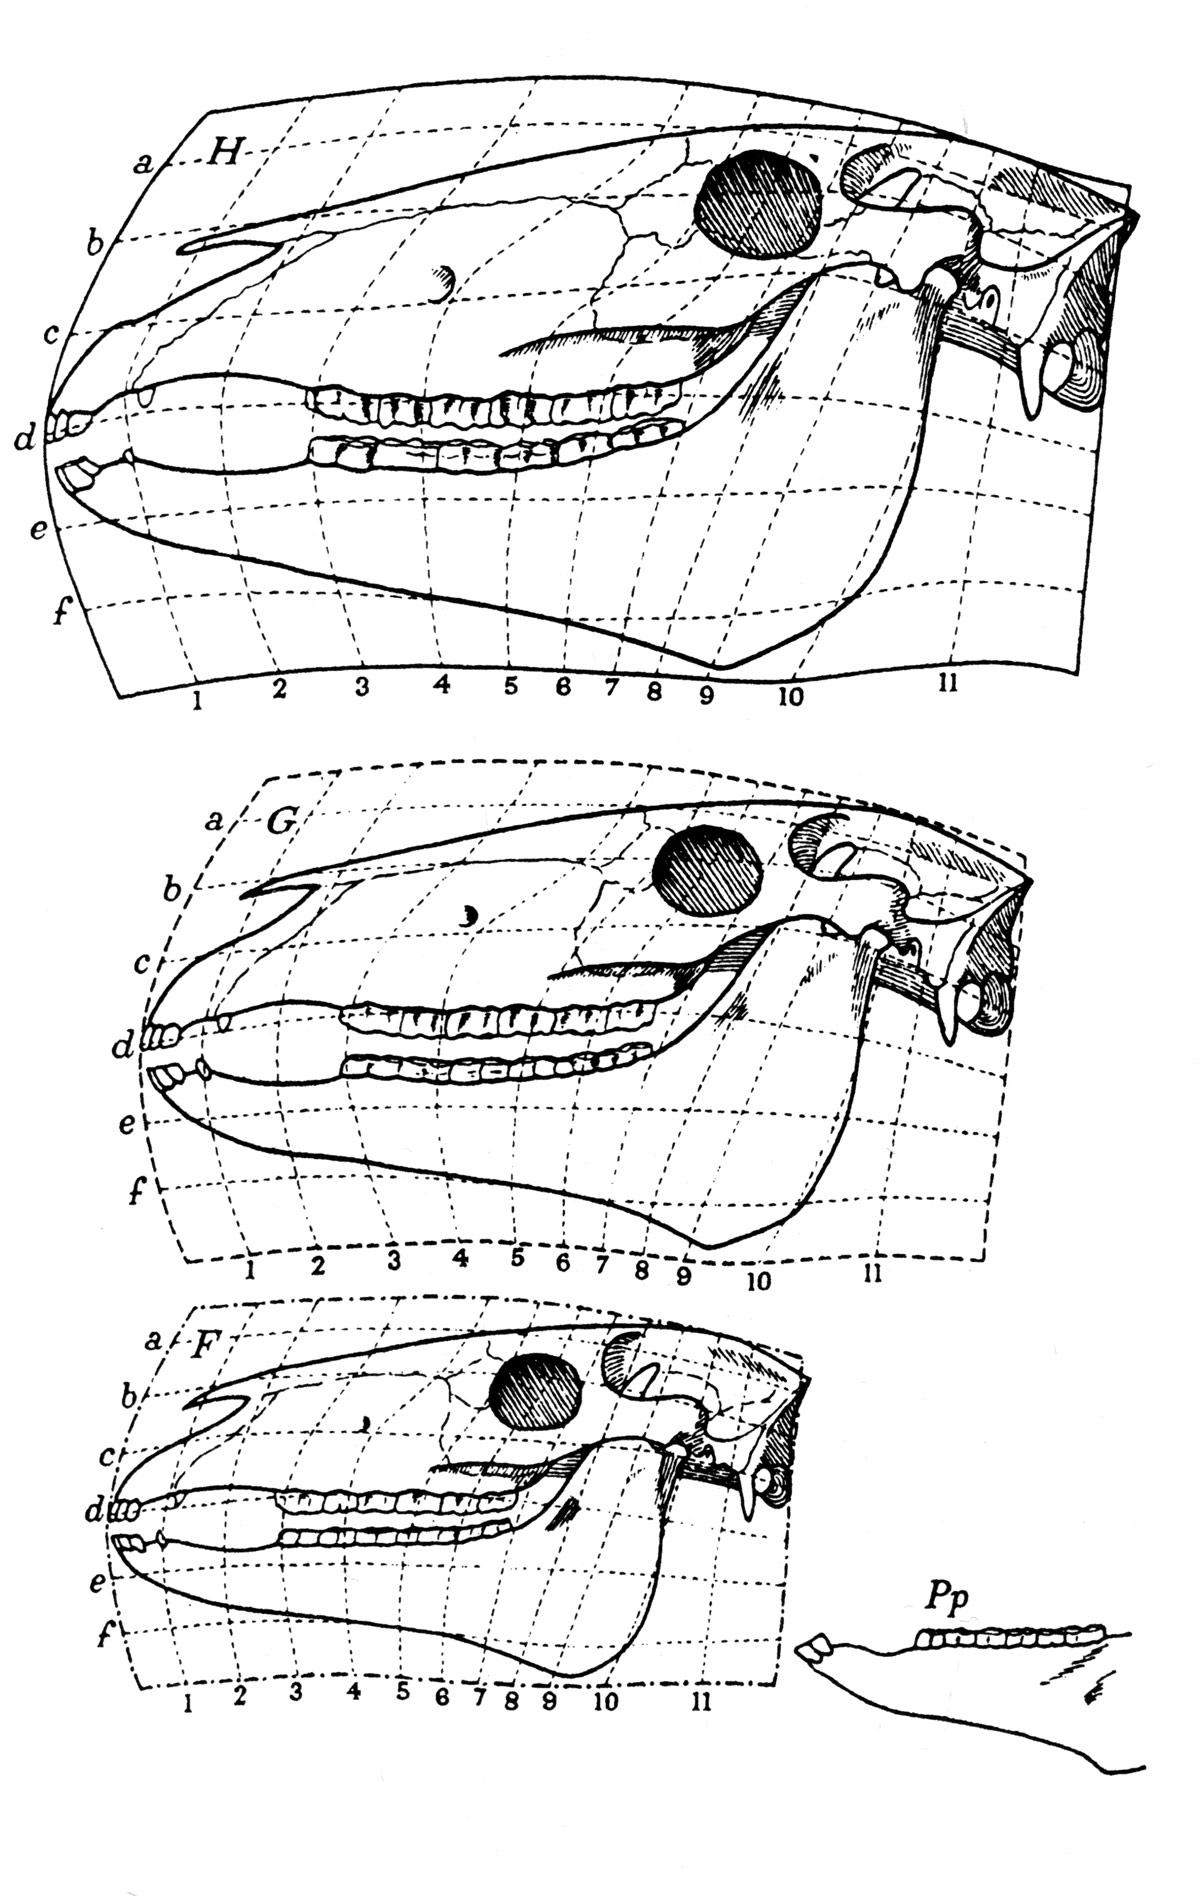 Fig. 3. Cheval moderne, F. Miohippus (Eocène supérieur - Oligocène inférieur), G.Forme intermédaiore restituée (fig. 175).